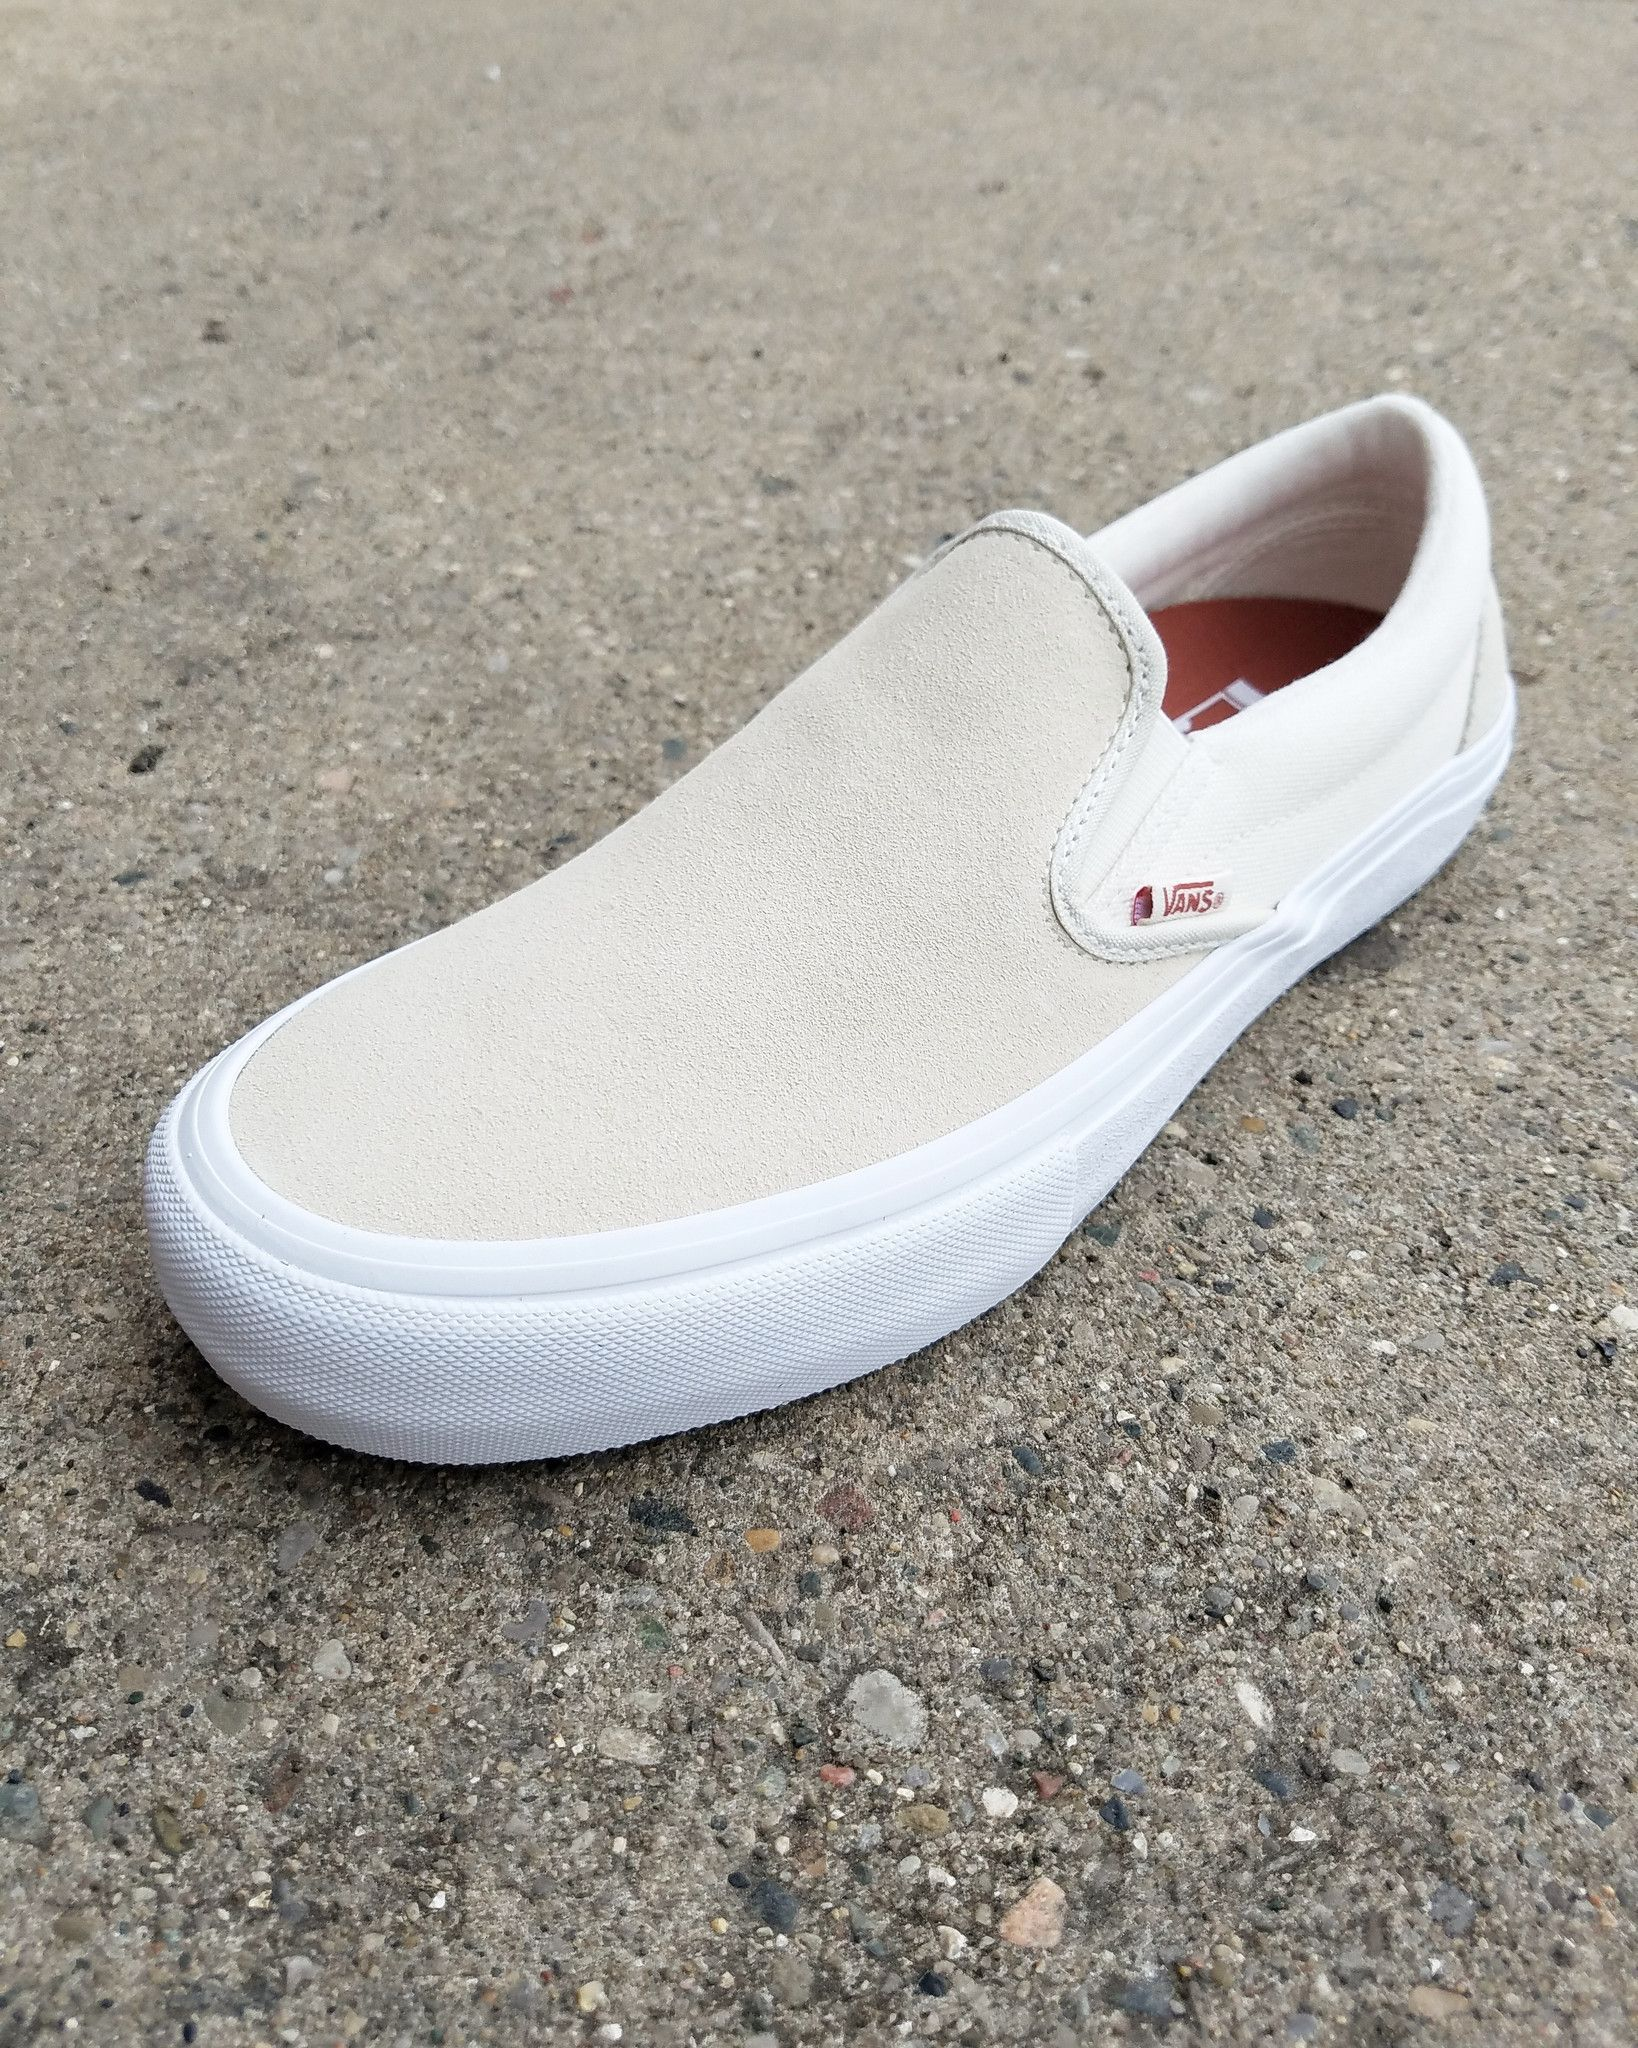 Vans Slip On Pro Shoes Turtledove Marshmallow